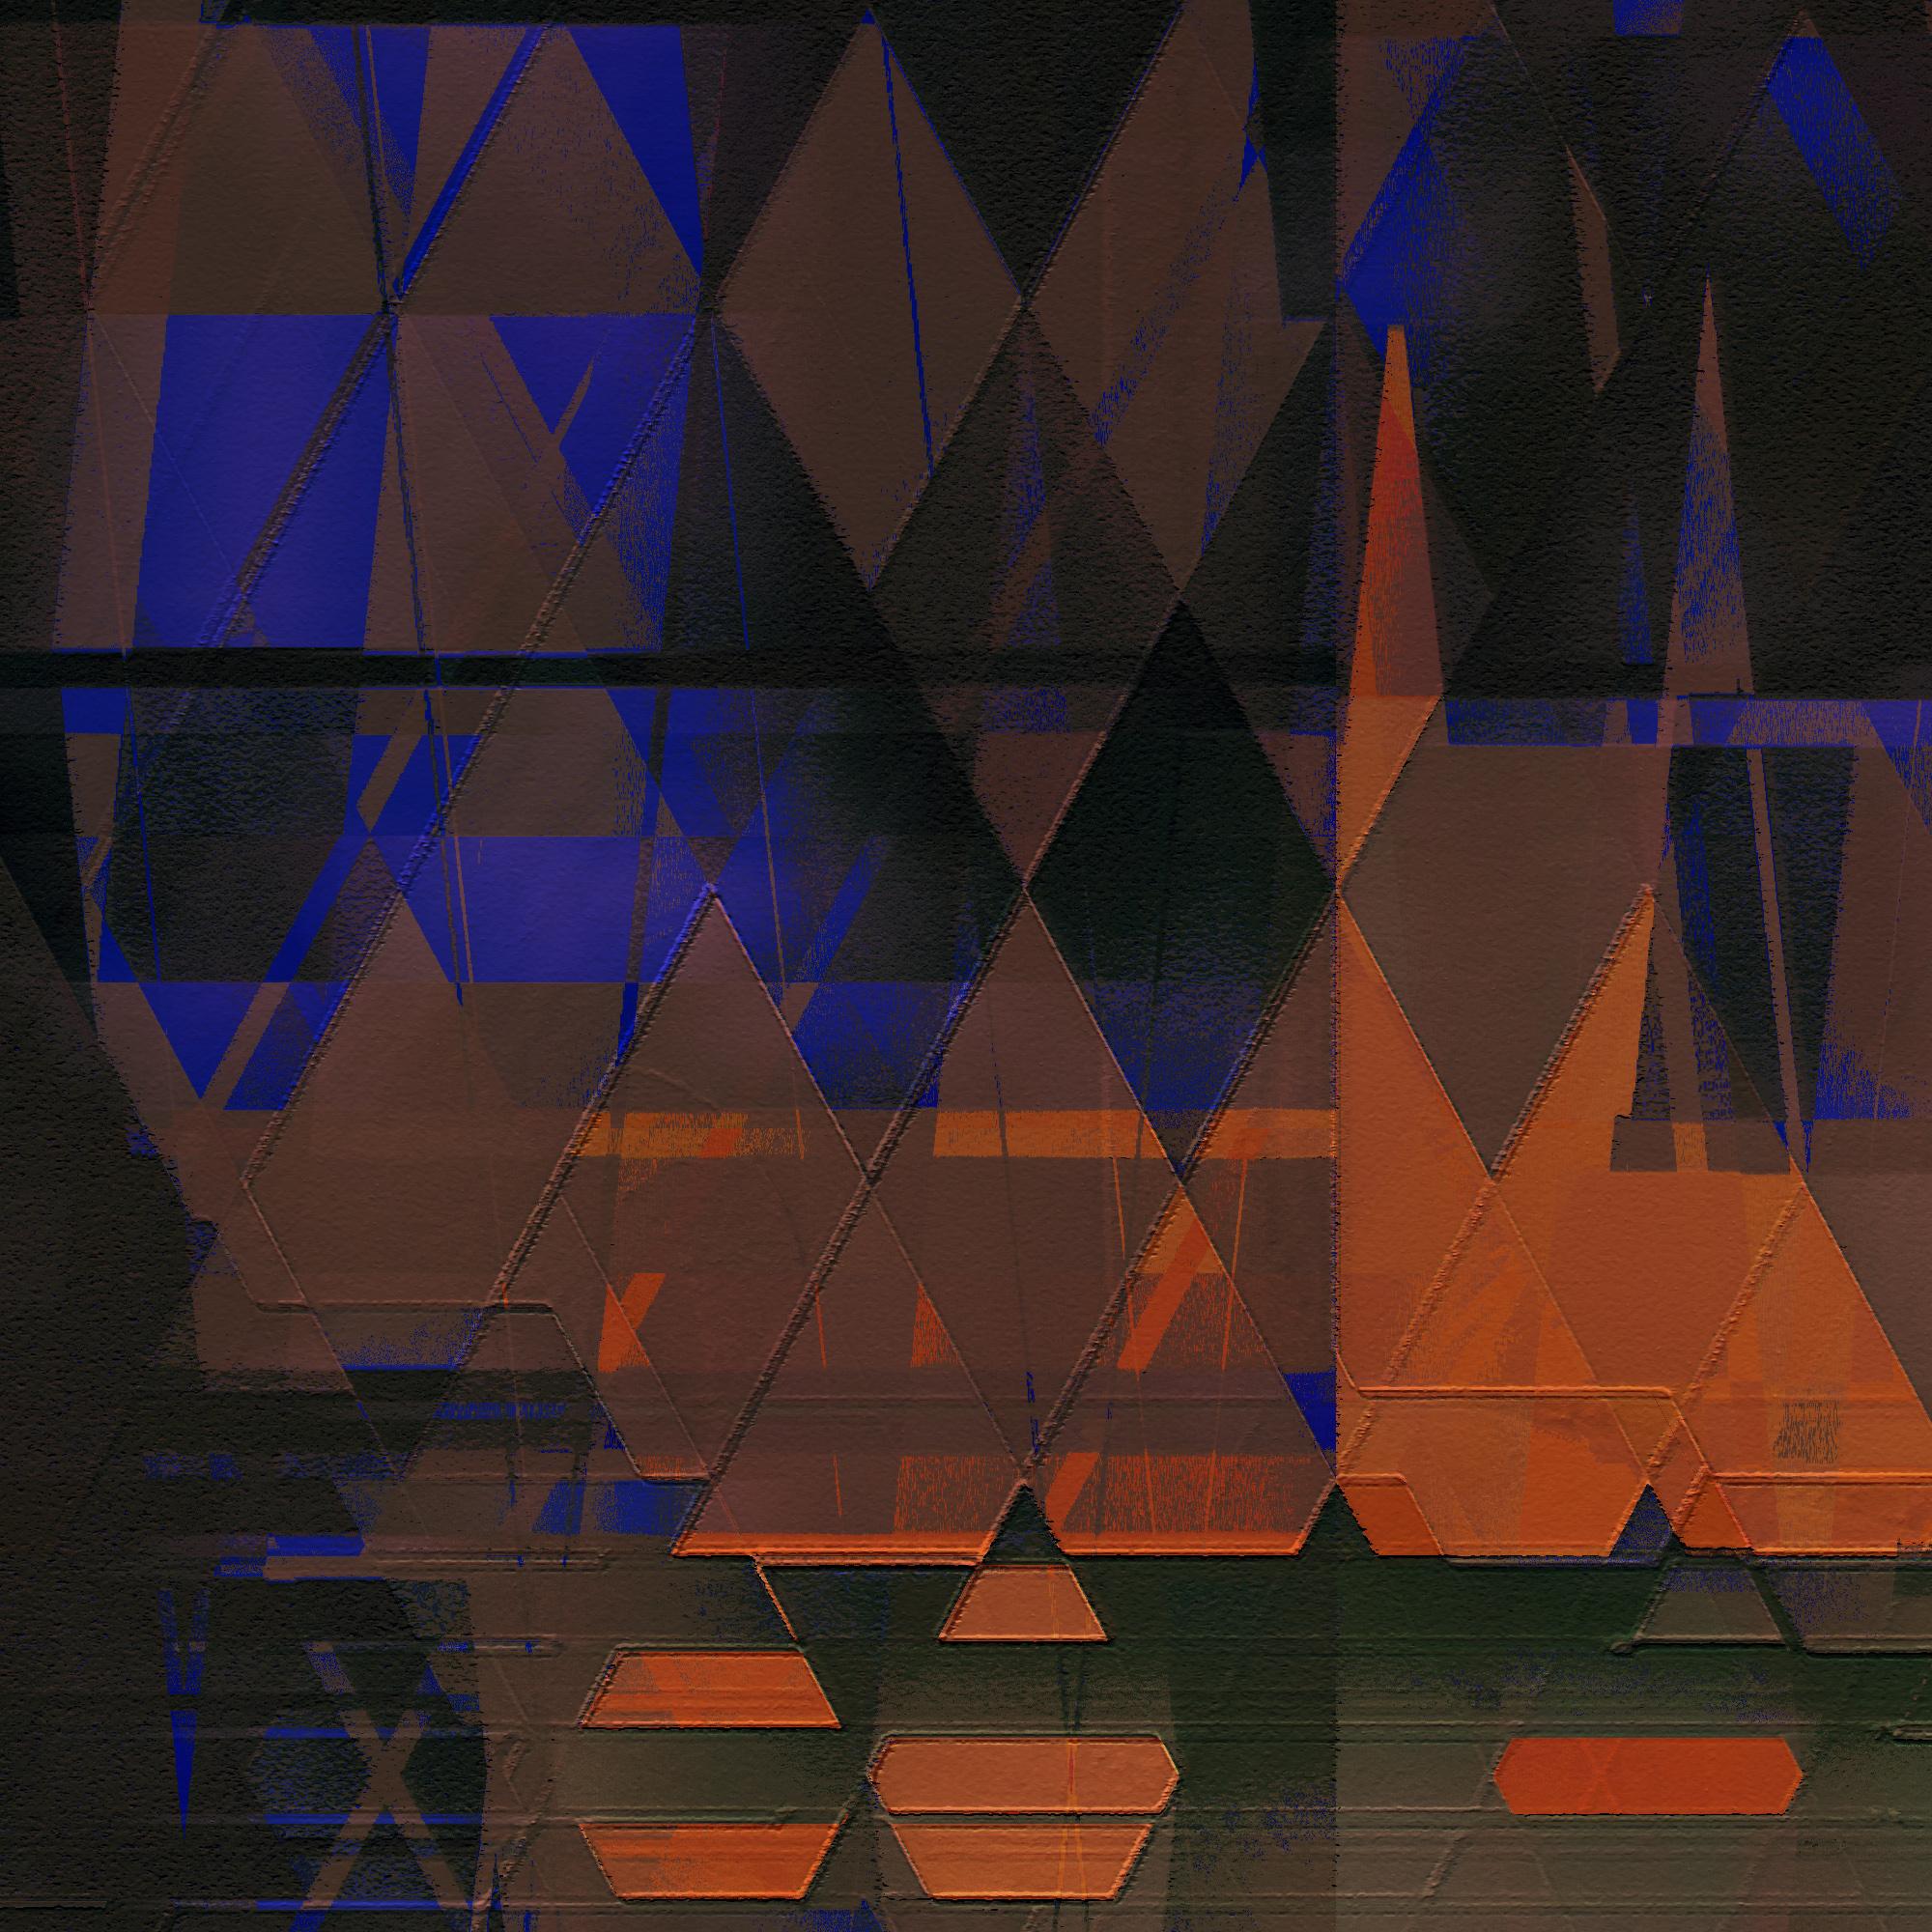 190404_Netherworld_detail5.jpg